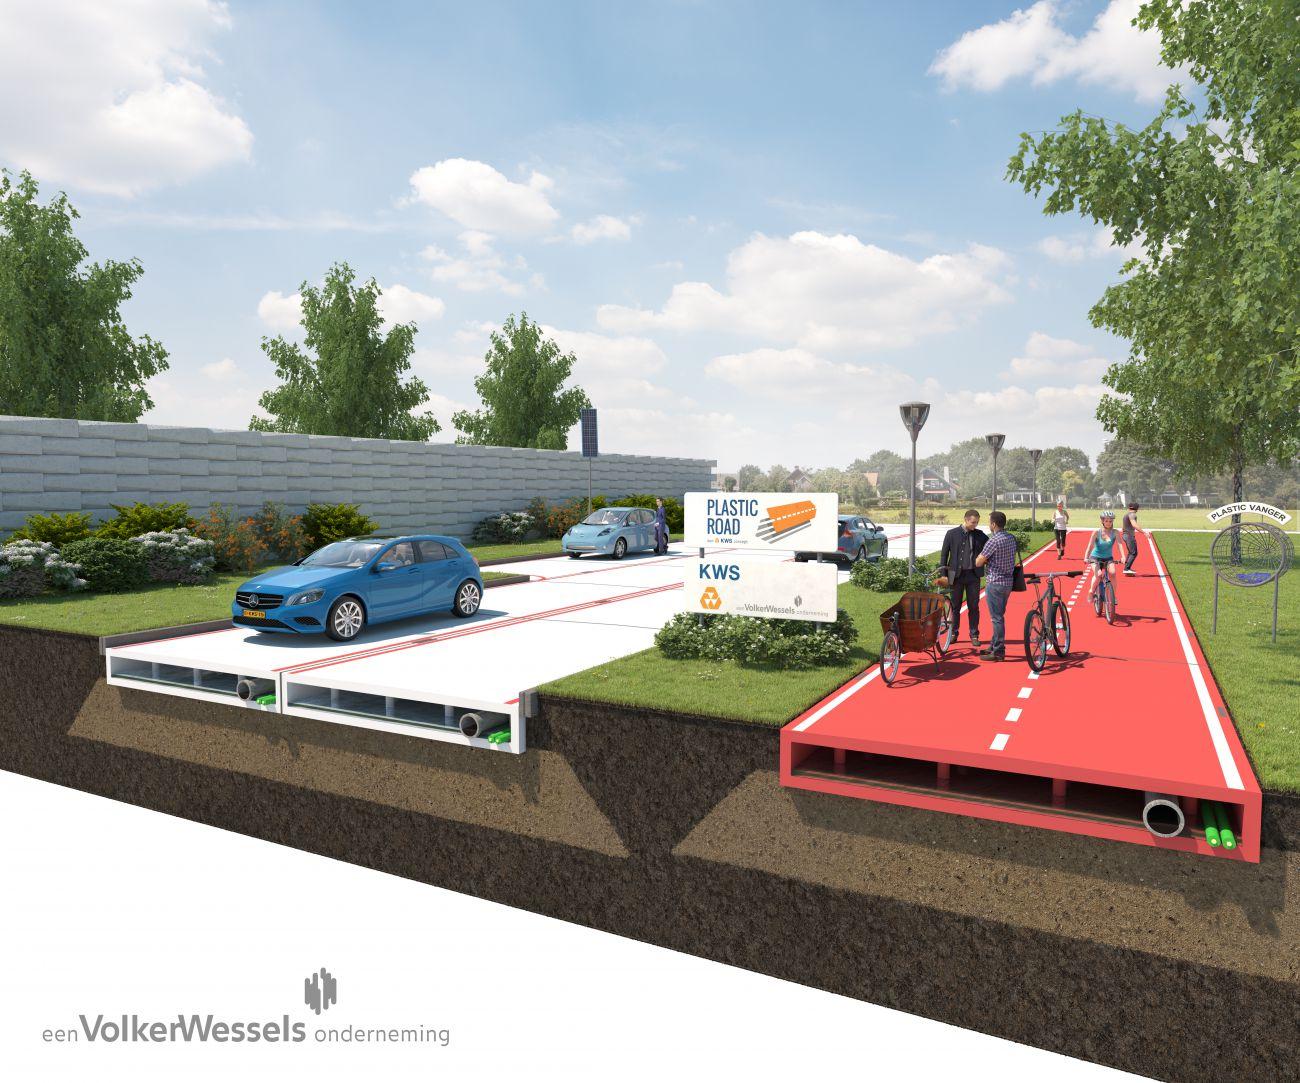 Road Blocks: LEGO-Like Modular Roads & Paths Snap Into Place